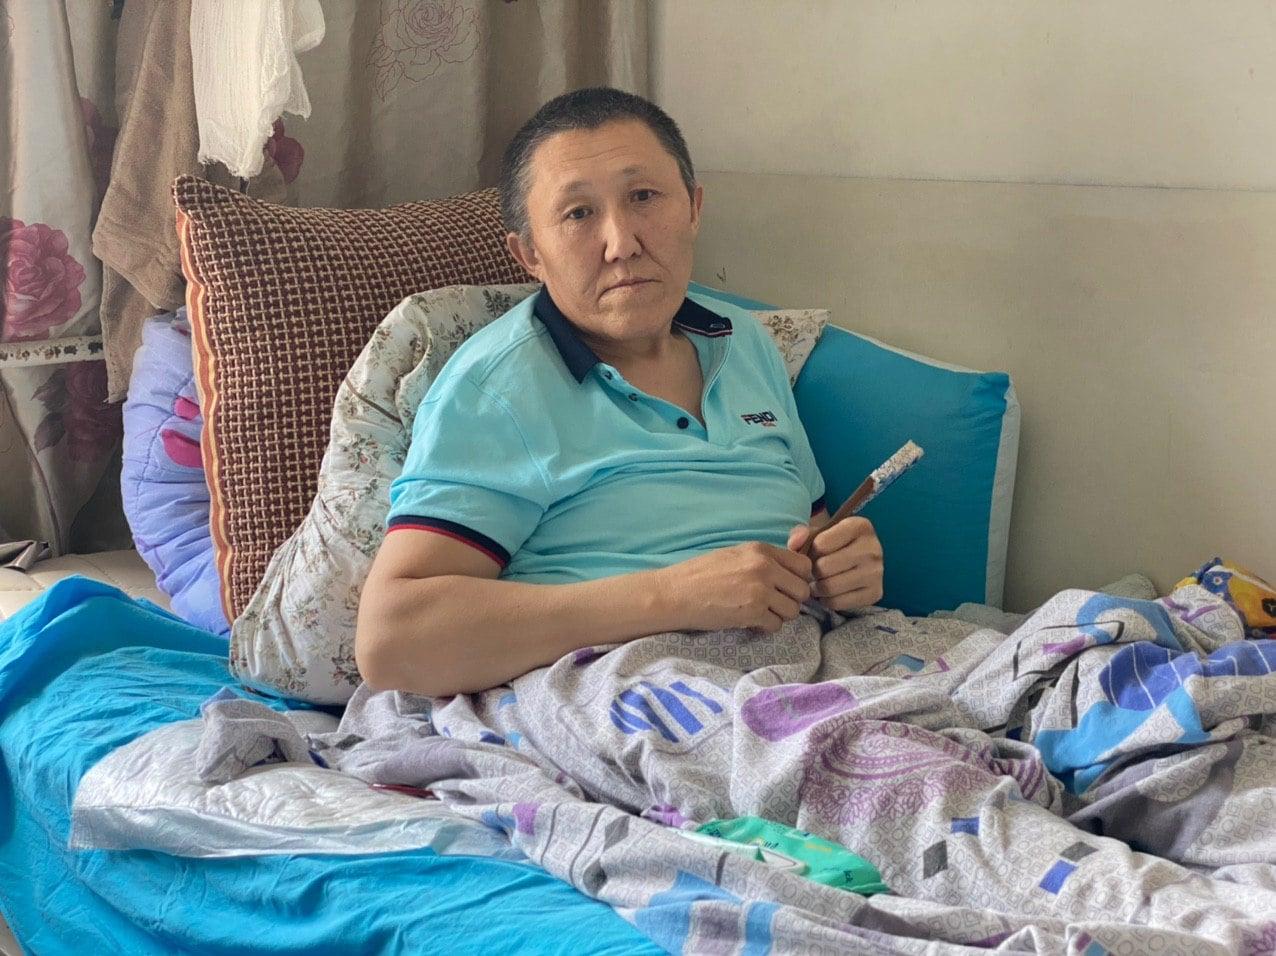 Ырчы Малик Аликеевге эки жолу операция жасалды – сүрөт